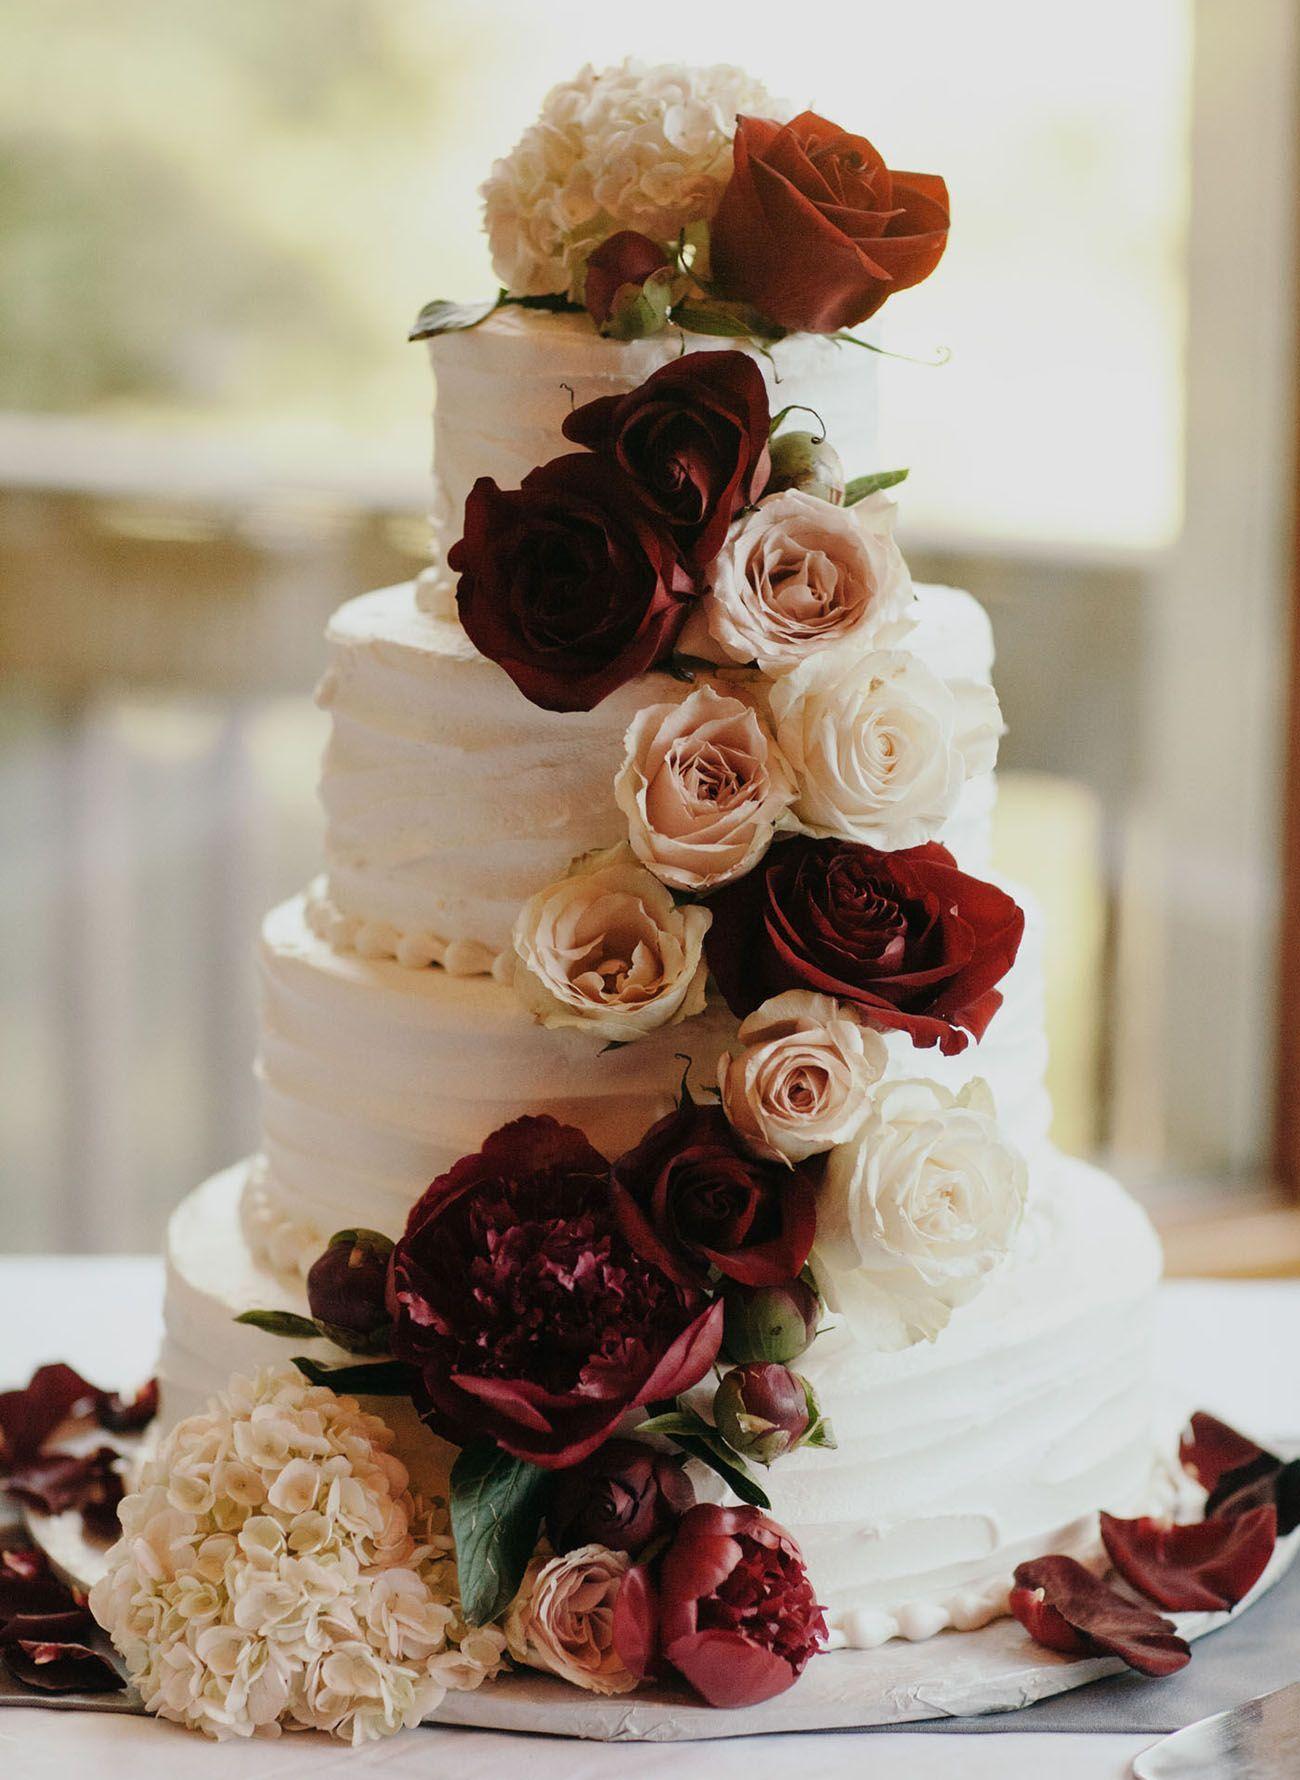 Burgundy Cream Rustic Chic Texas Wedding Burgundy Wedding Cake